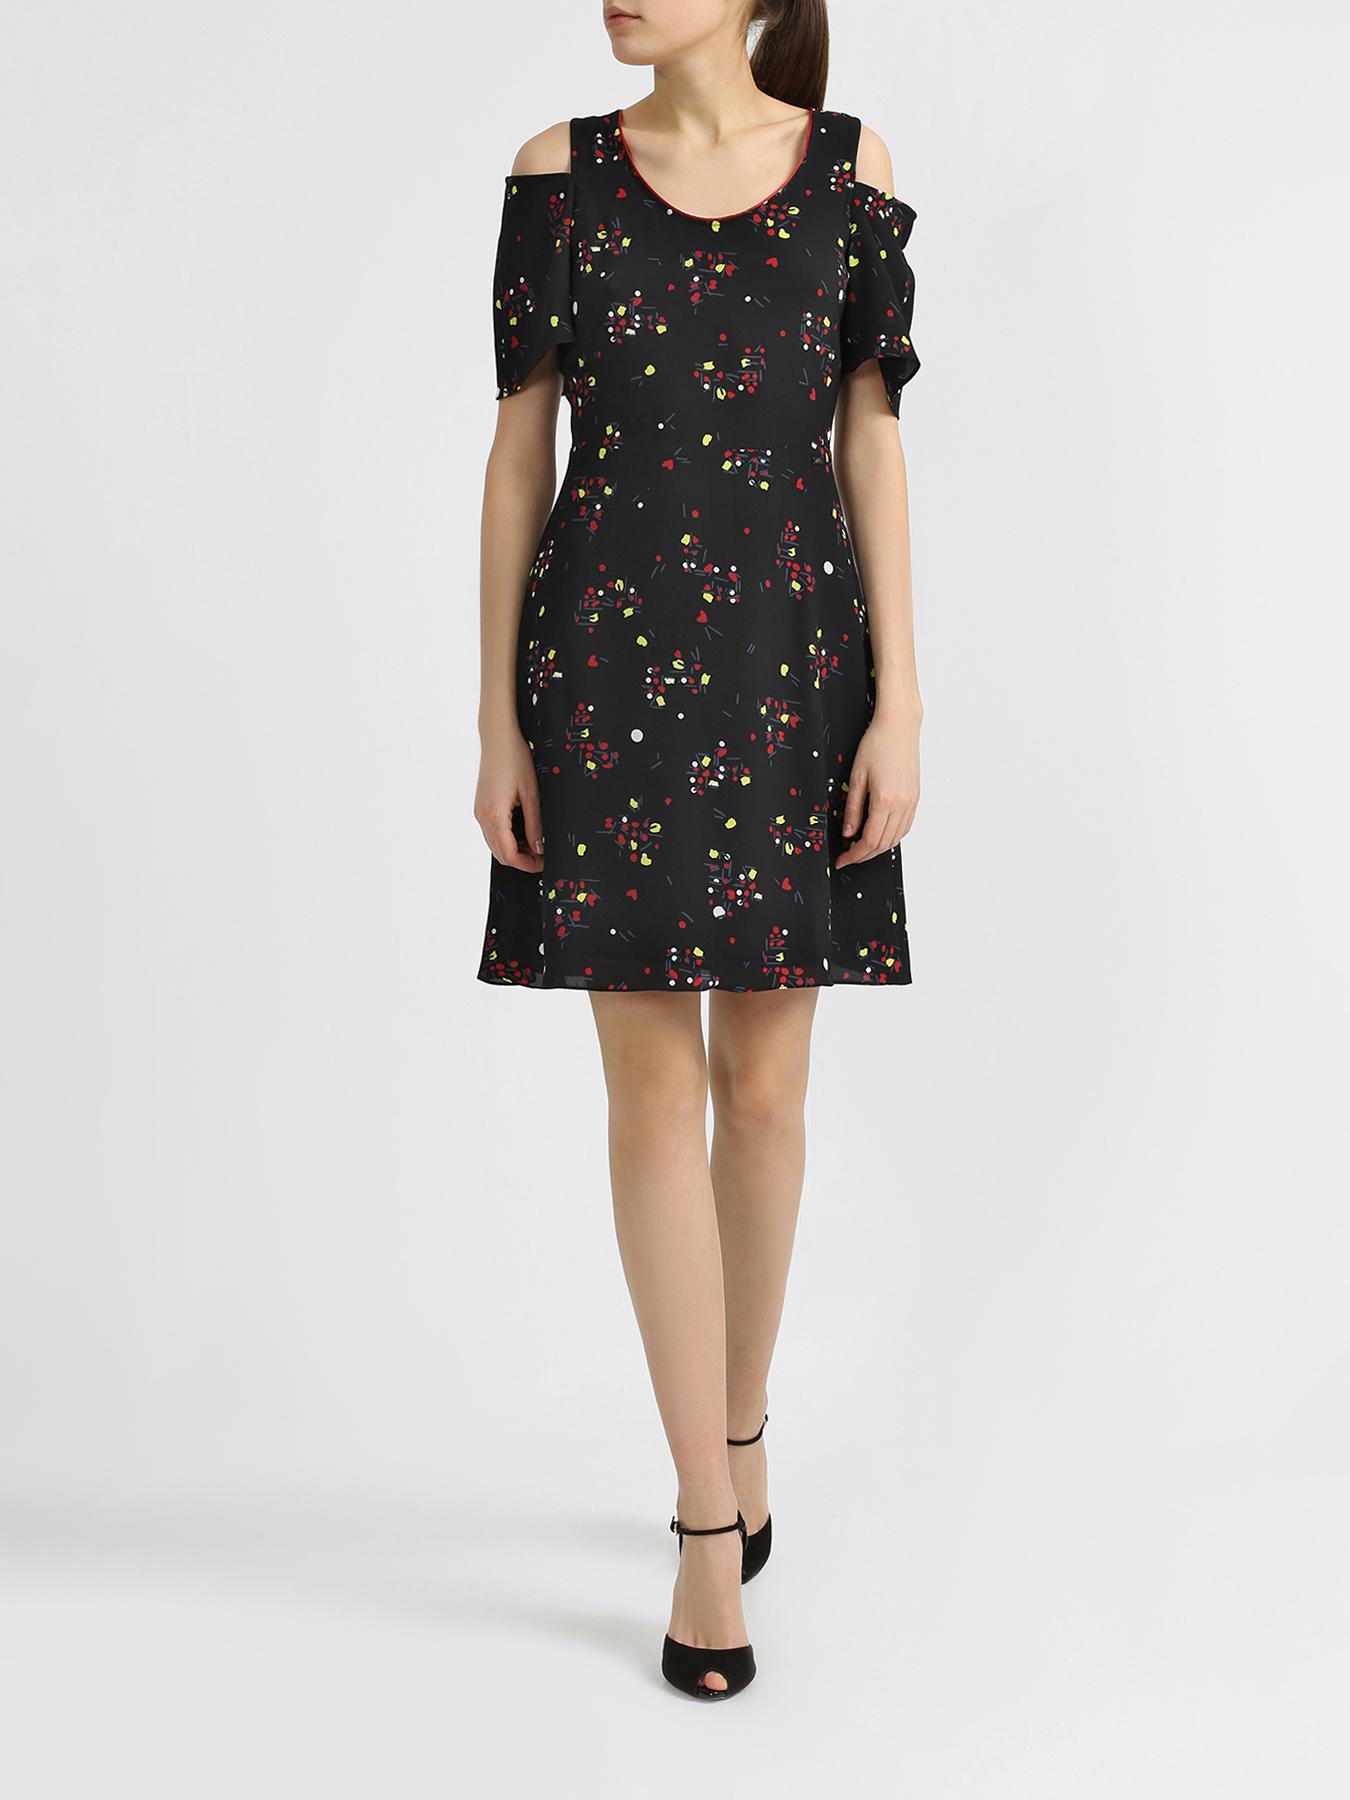 Платье Armani Exchange Платье с разрезами на рукавах